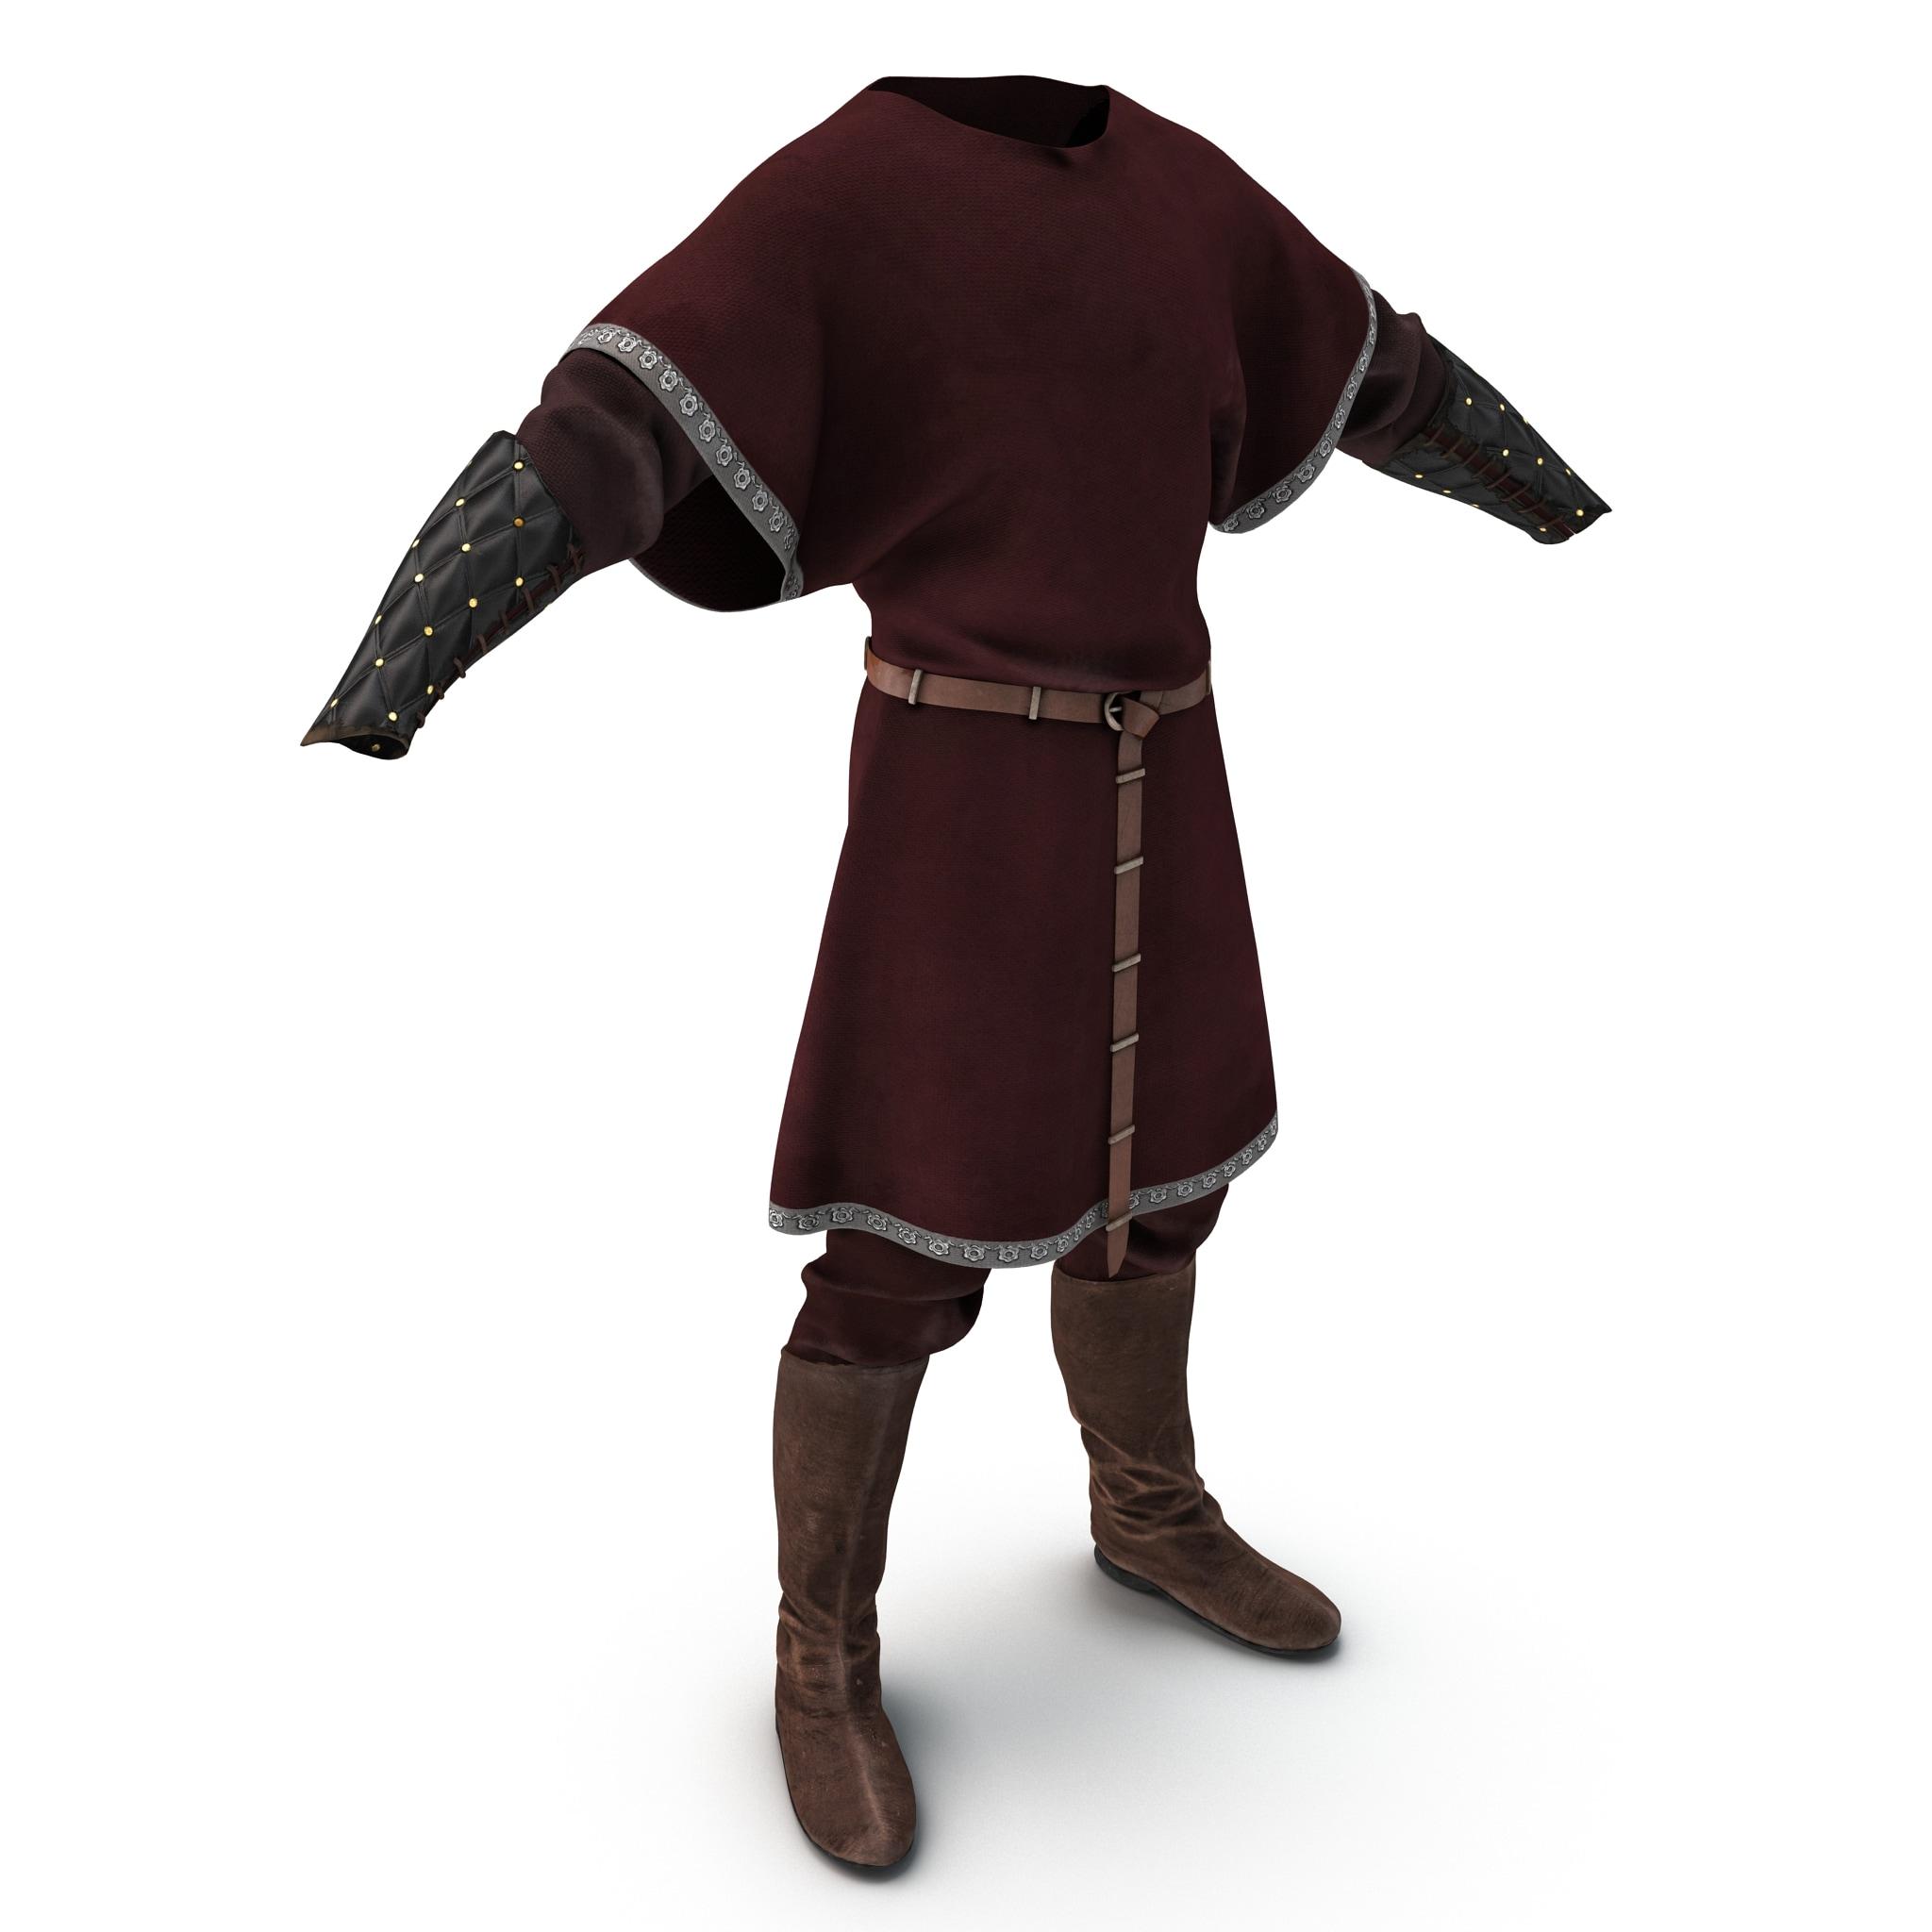 Medieval Clothes 7_89.jpg